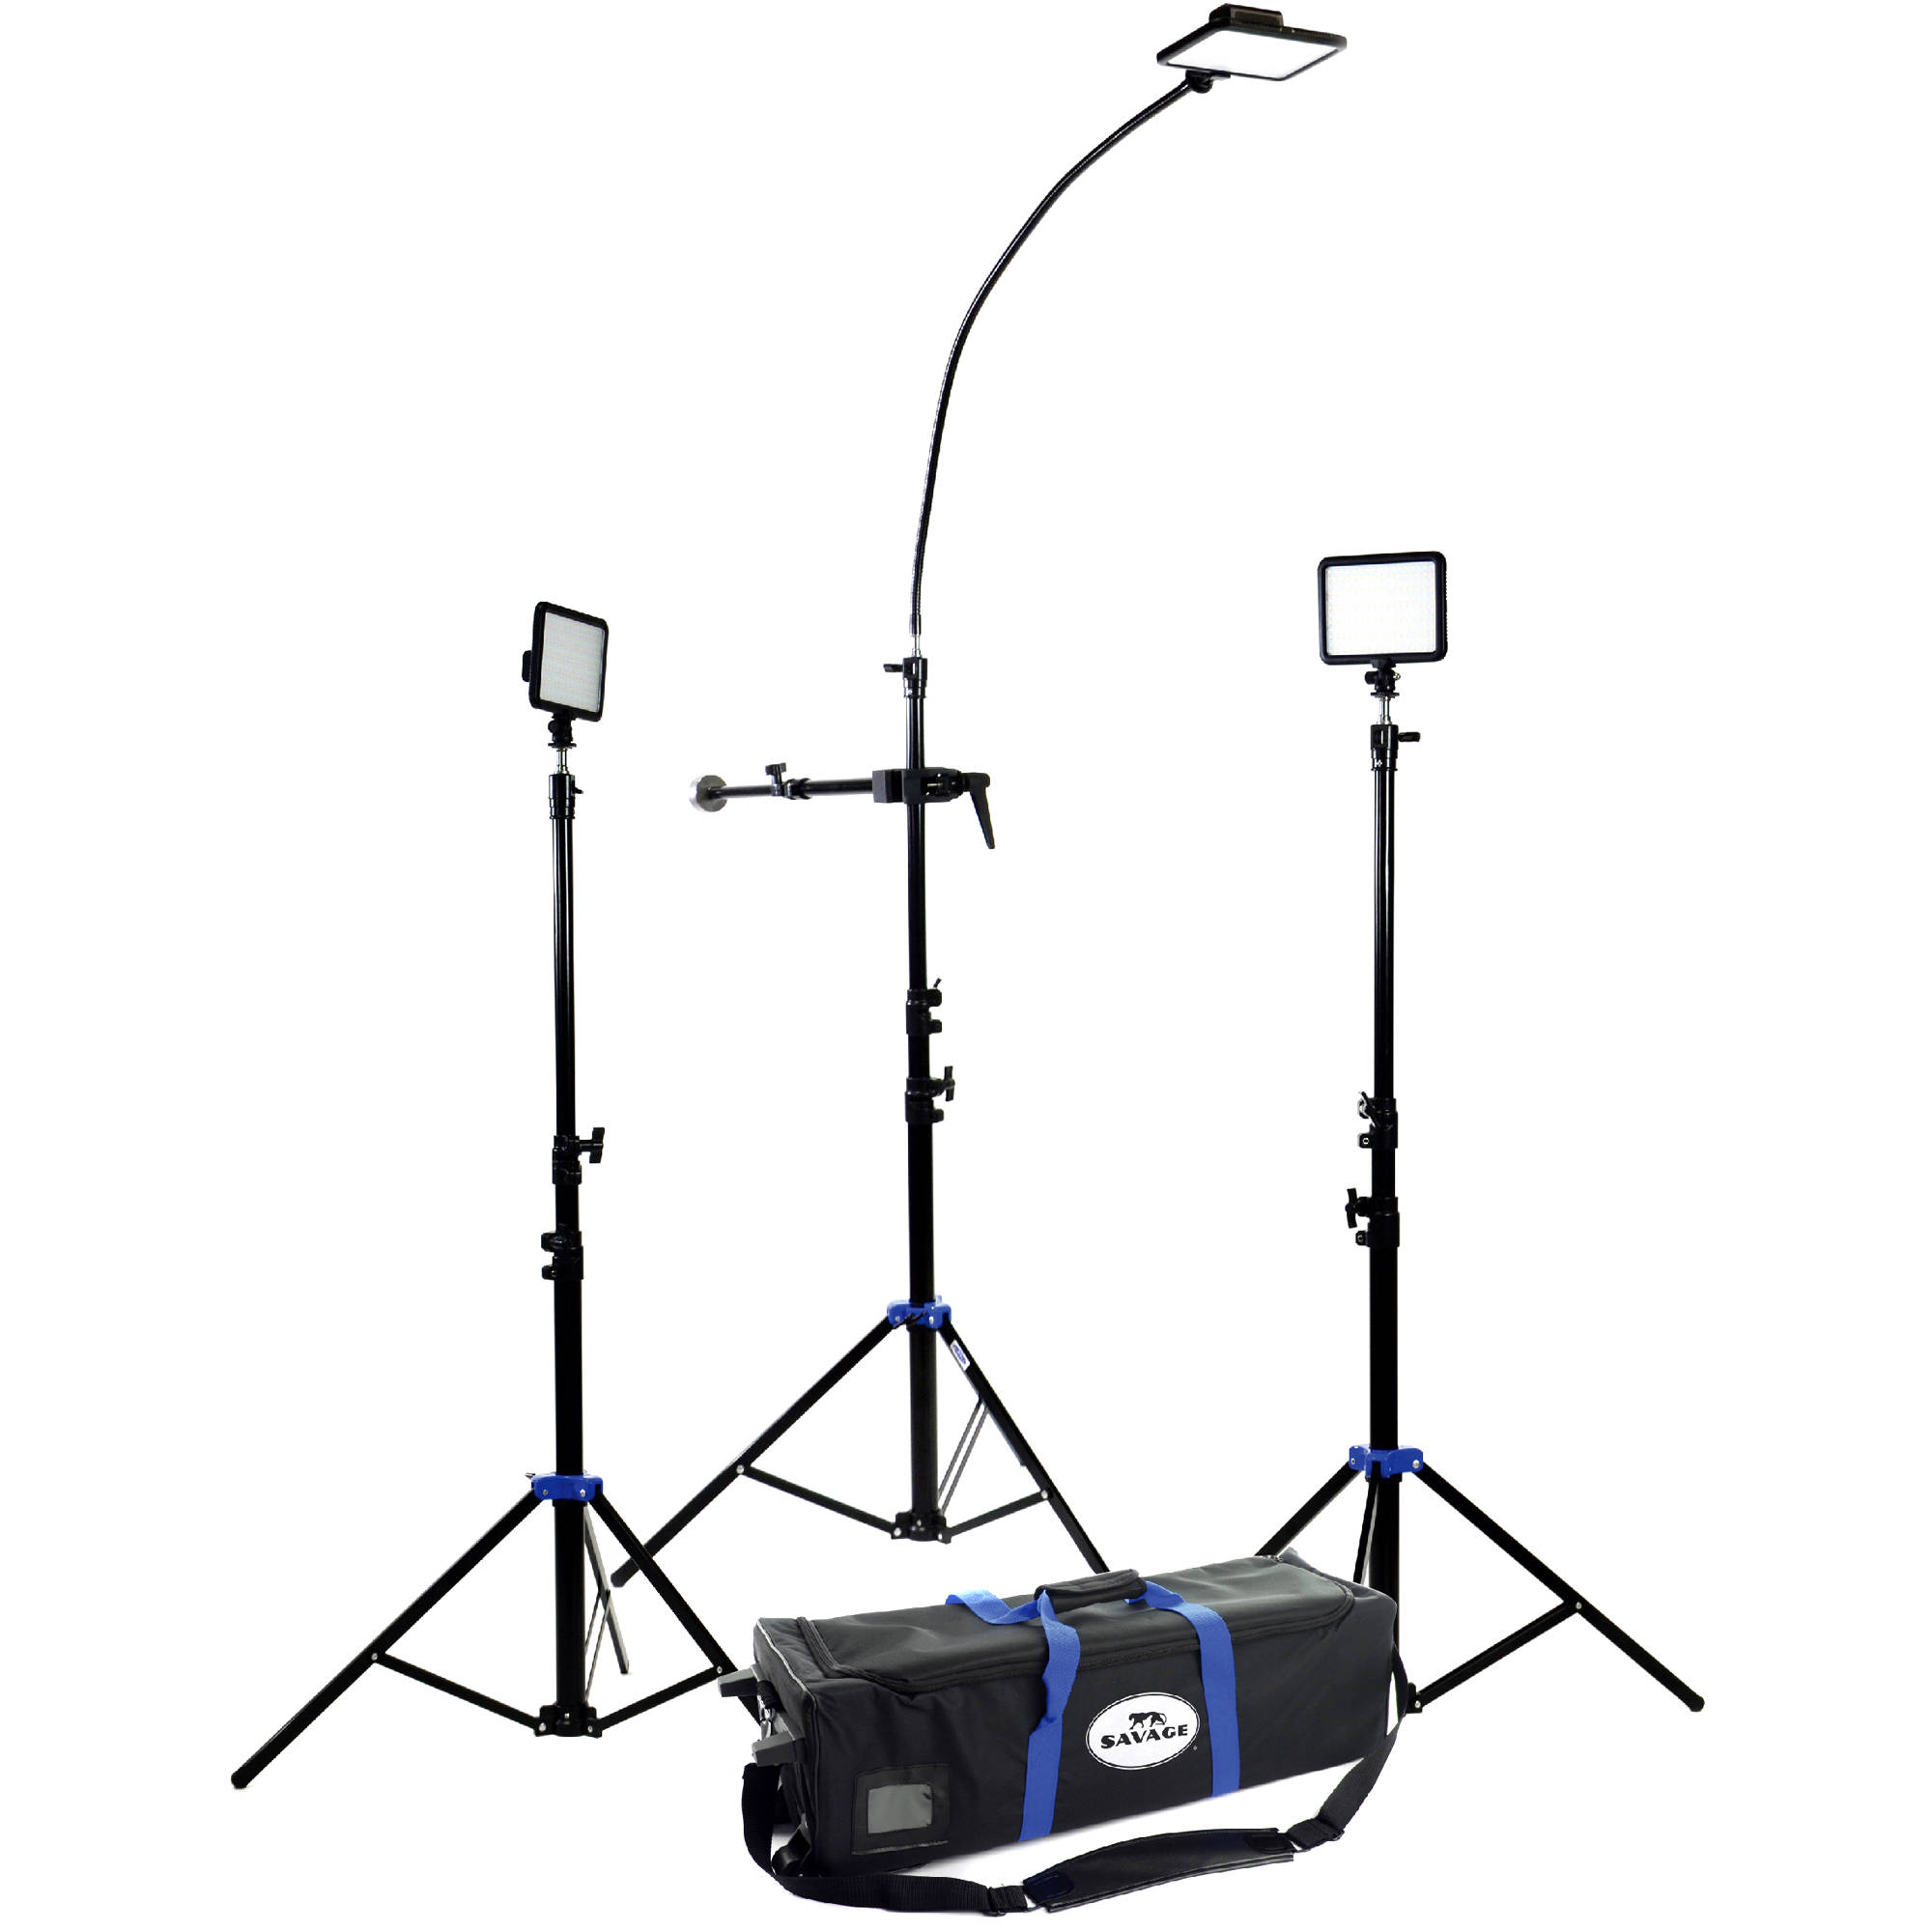 Savage Cobra Interview LED Light Kit INTV-3 B for Photography Lighting Equipment Names  76uhy